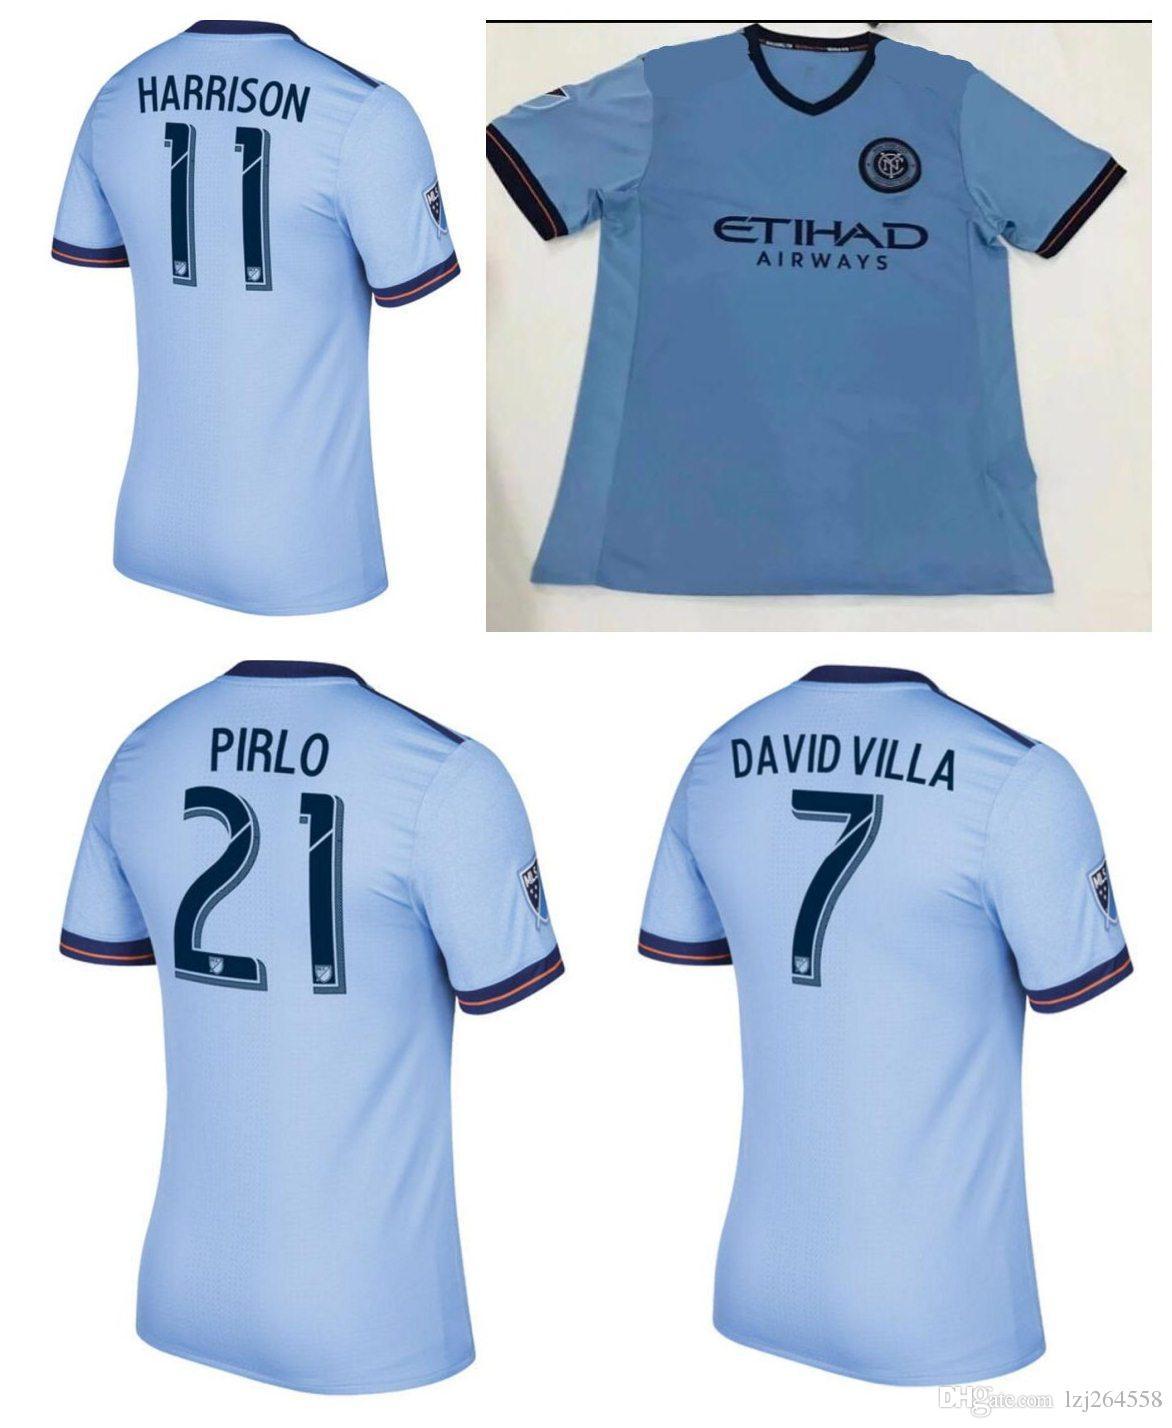 Whosales Discount New York City FC 2018 Soccer Jerseys 9b08f6fd99bf